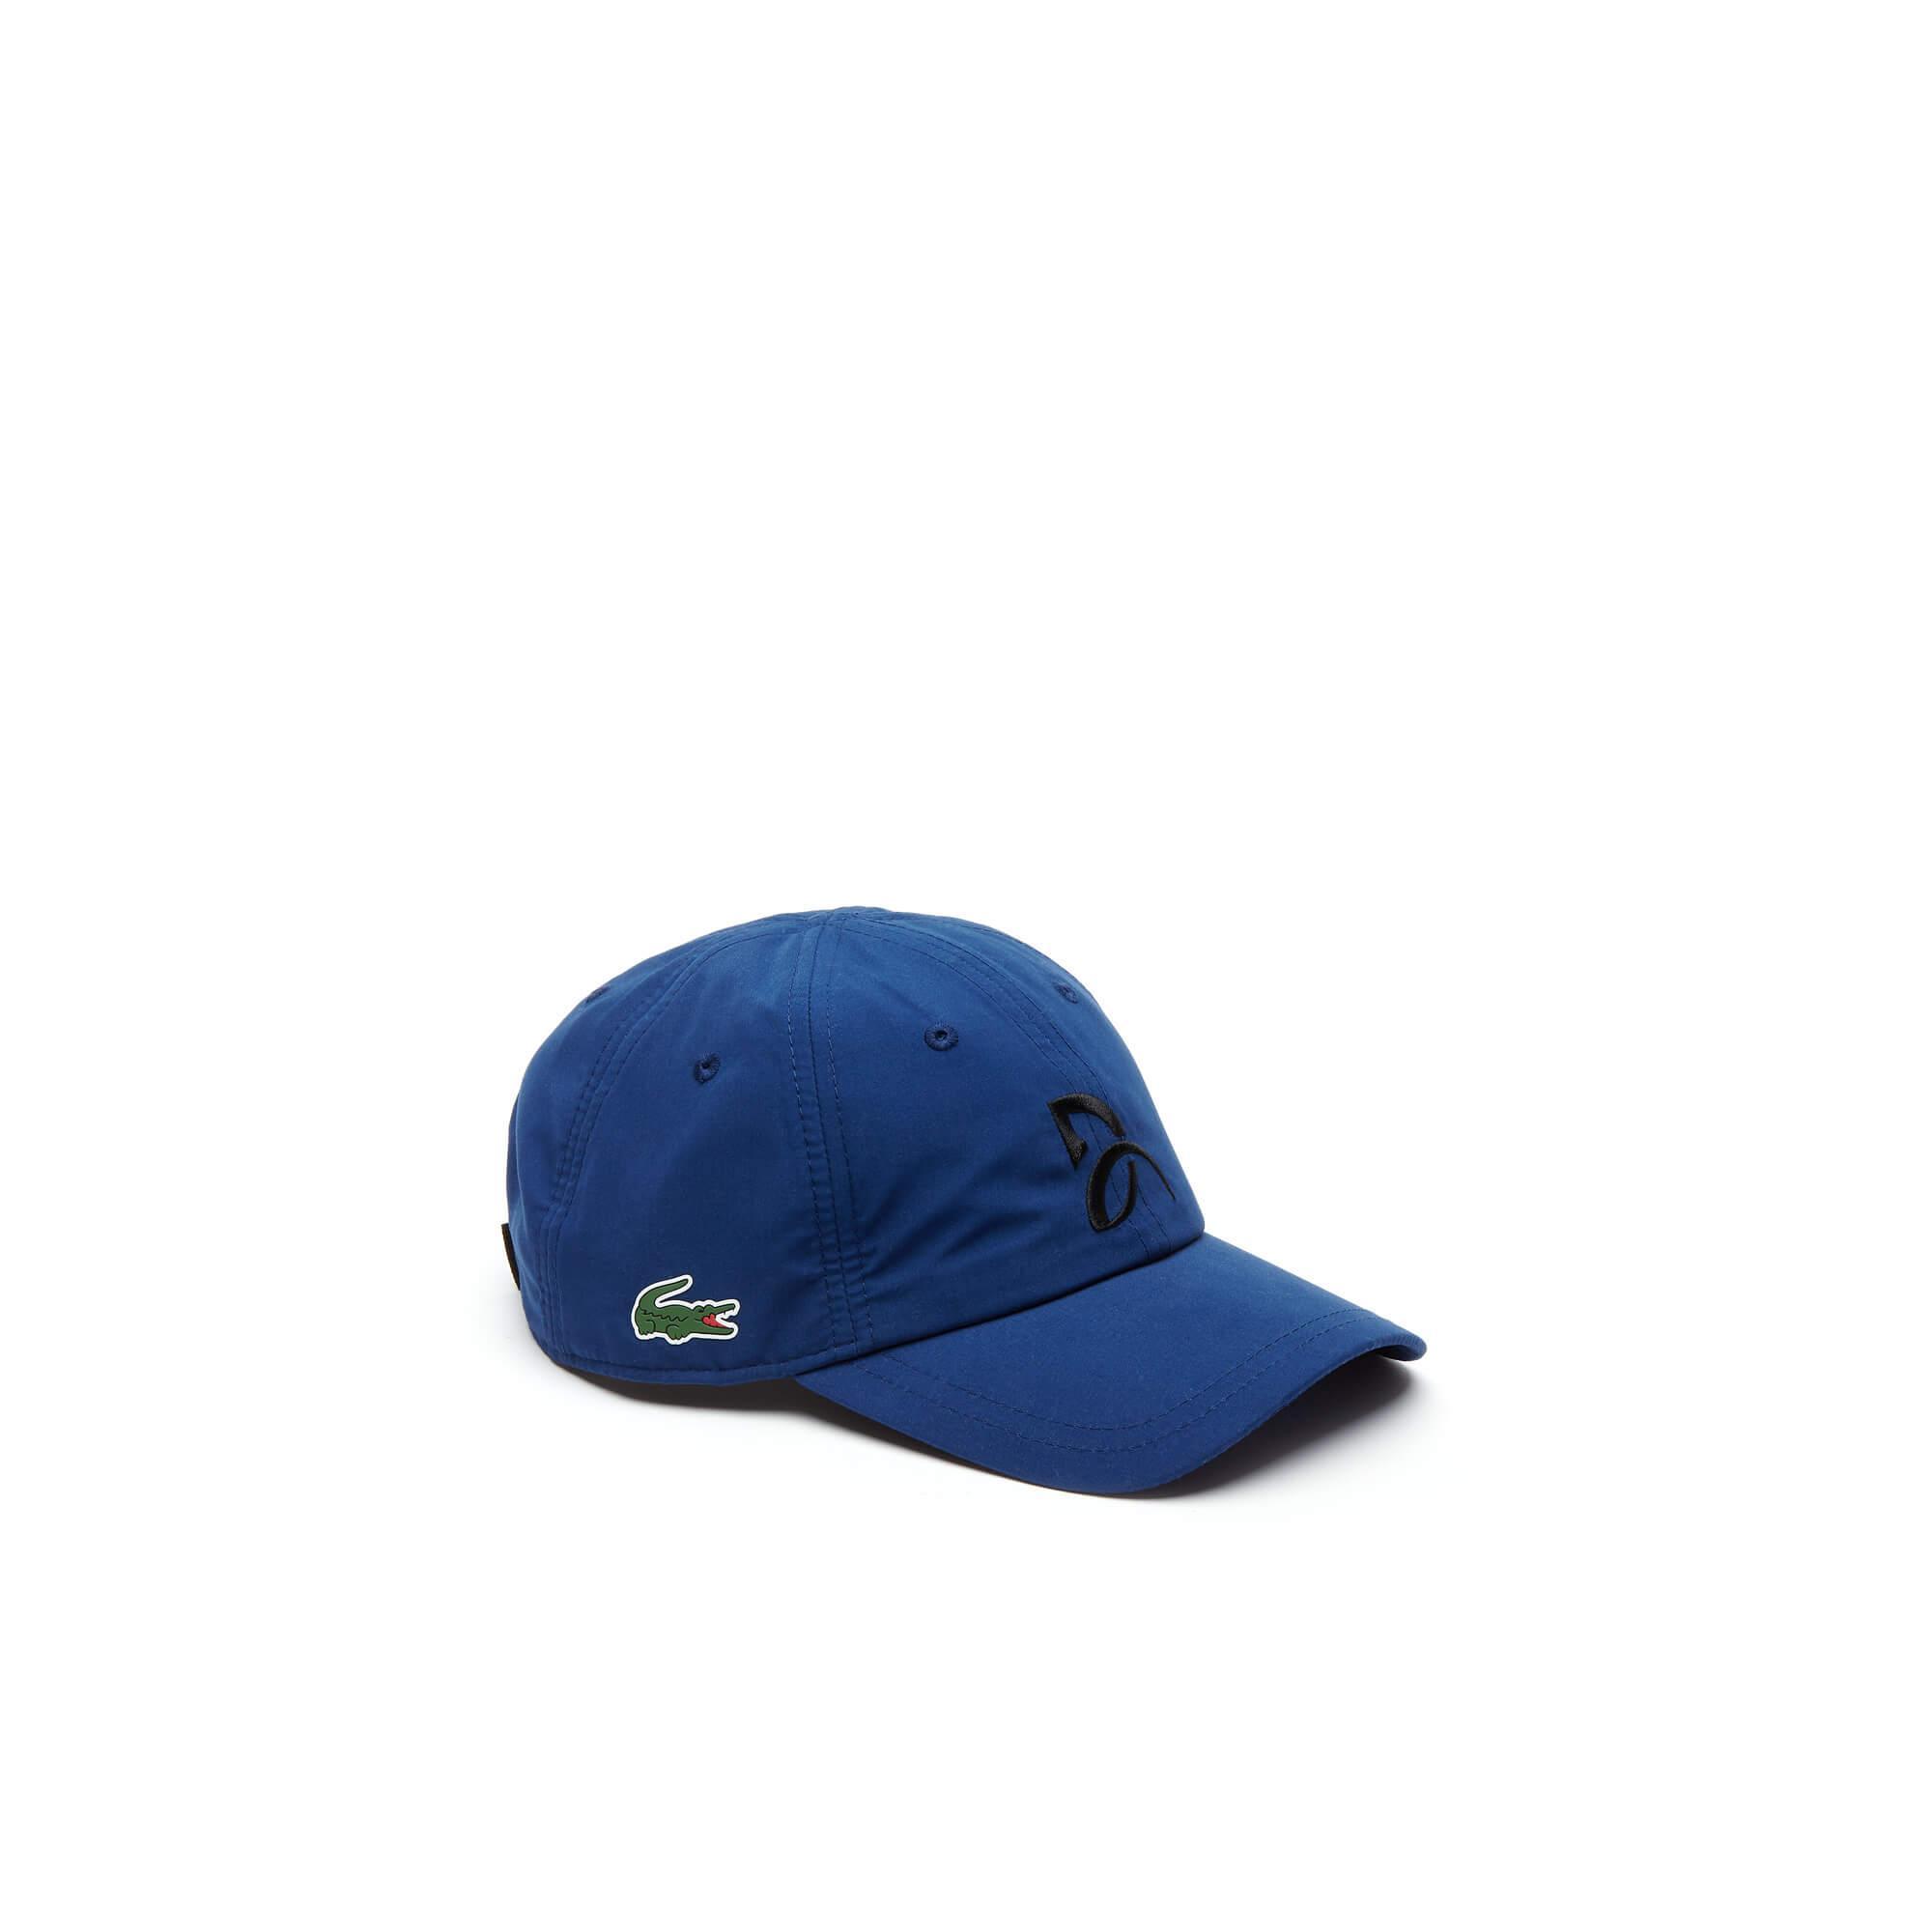 Lacoste Erkek Novak Djokovic Mavi Spor Şapka